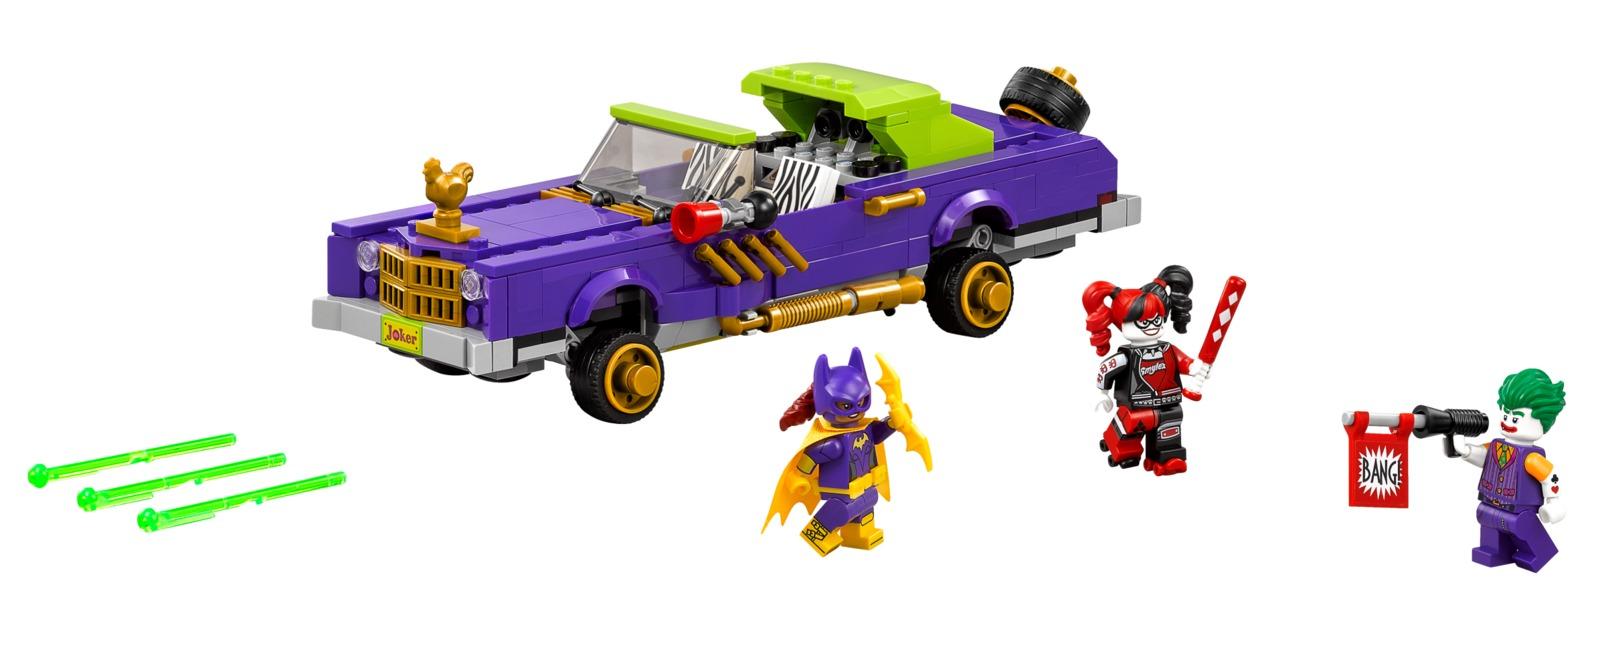 LEGO Batman Movie: The Joker's Notorious Lowrider (70906) image